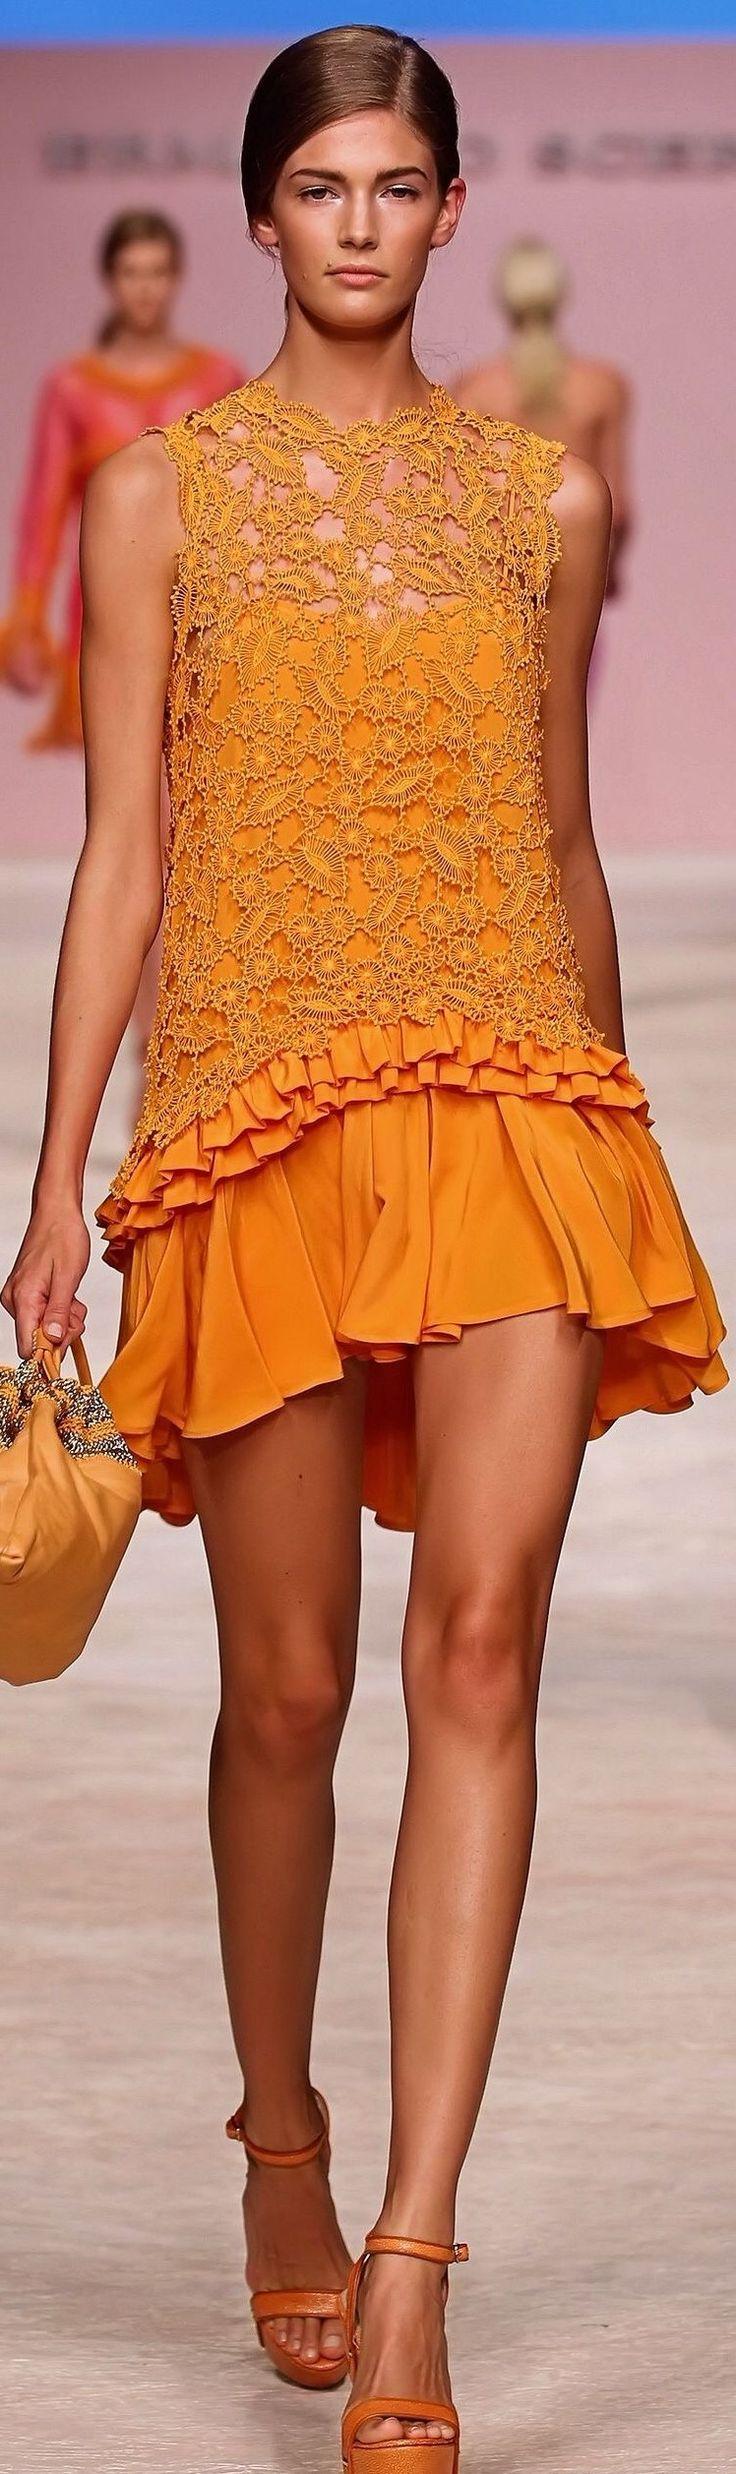 Short dress on a long legged model | Vestidos